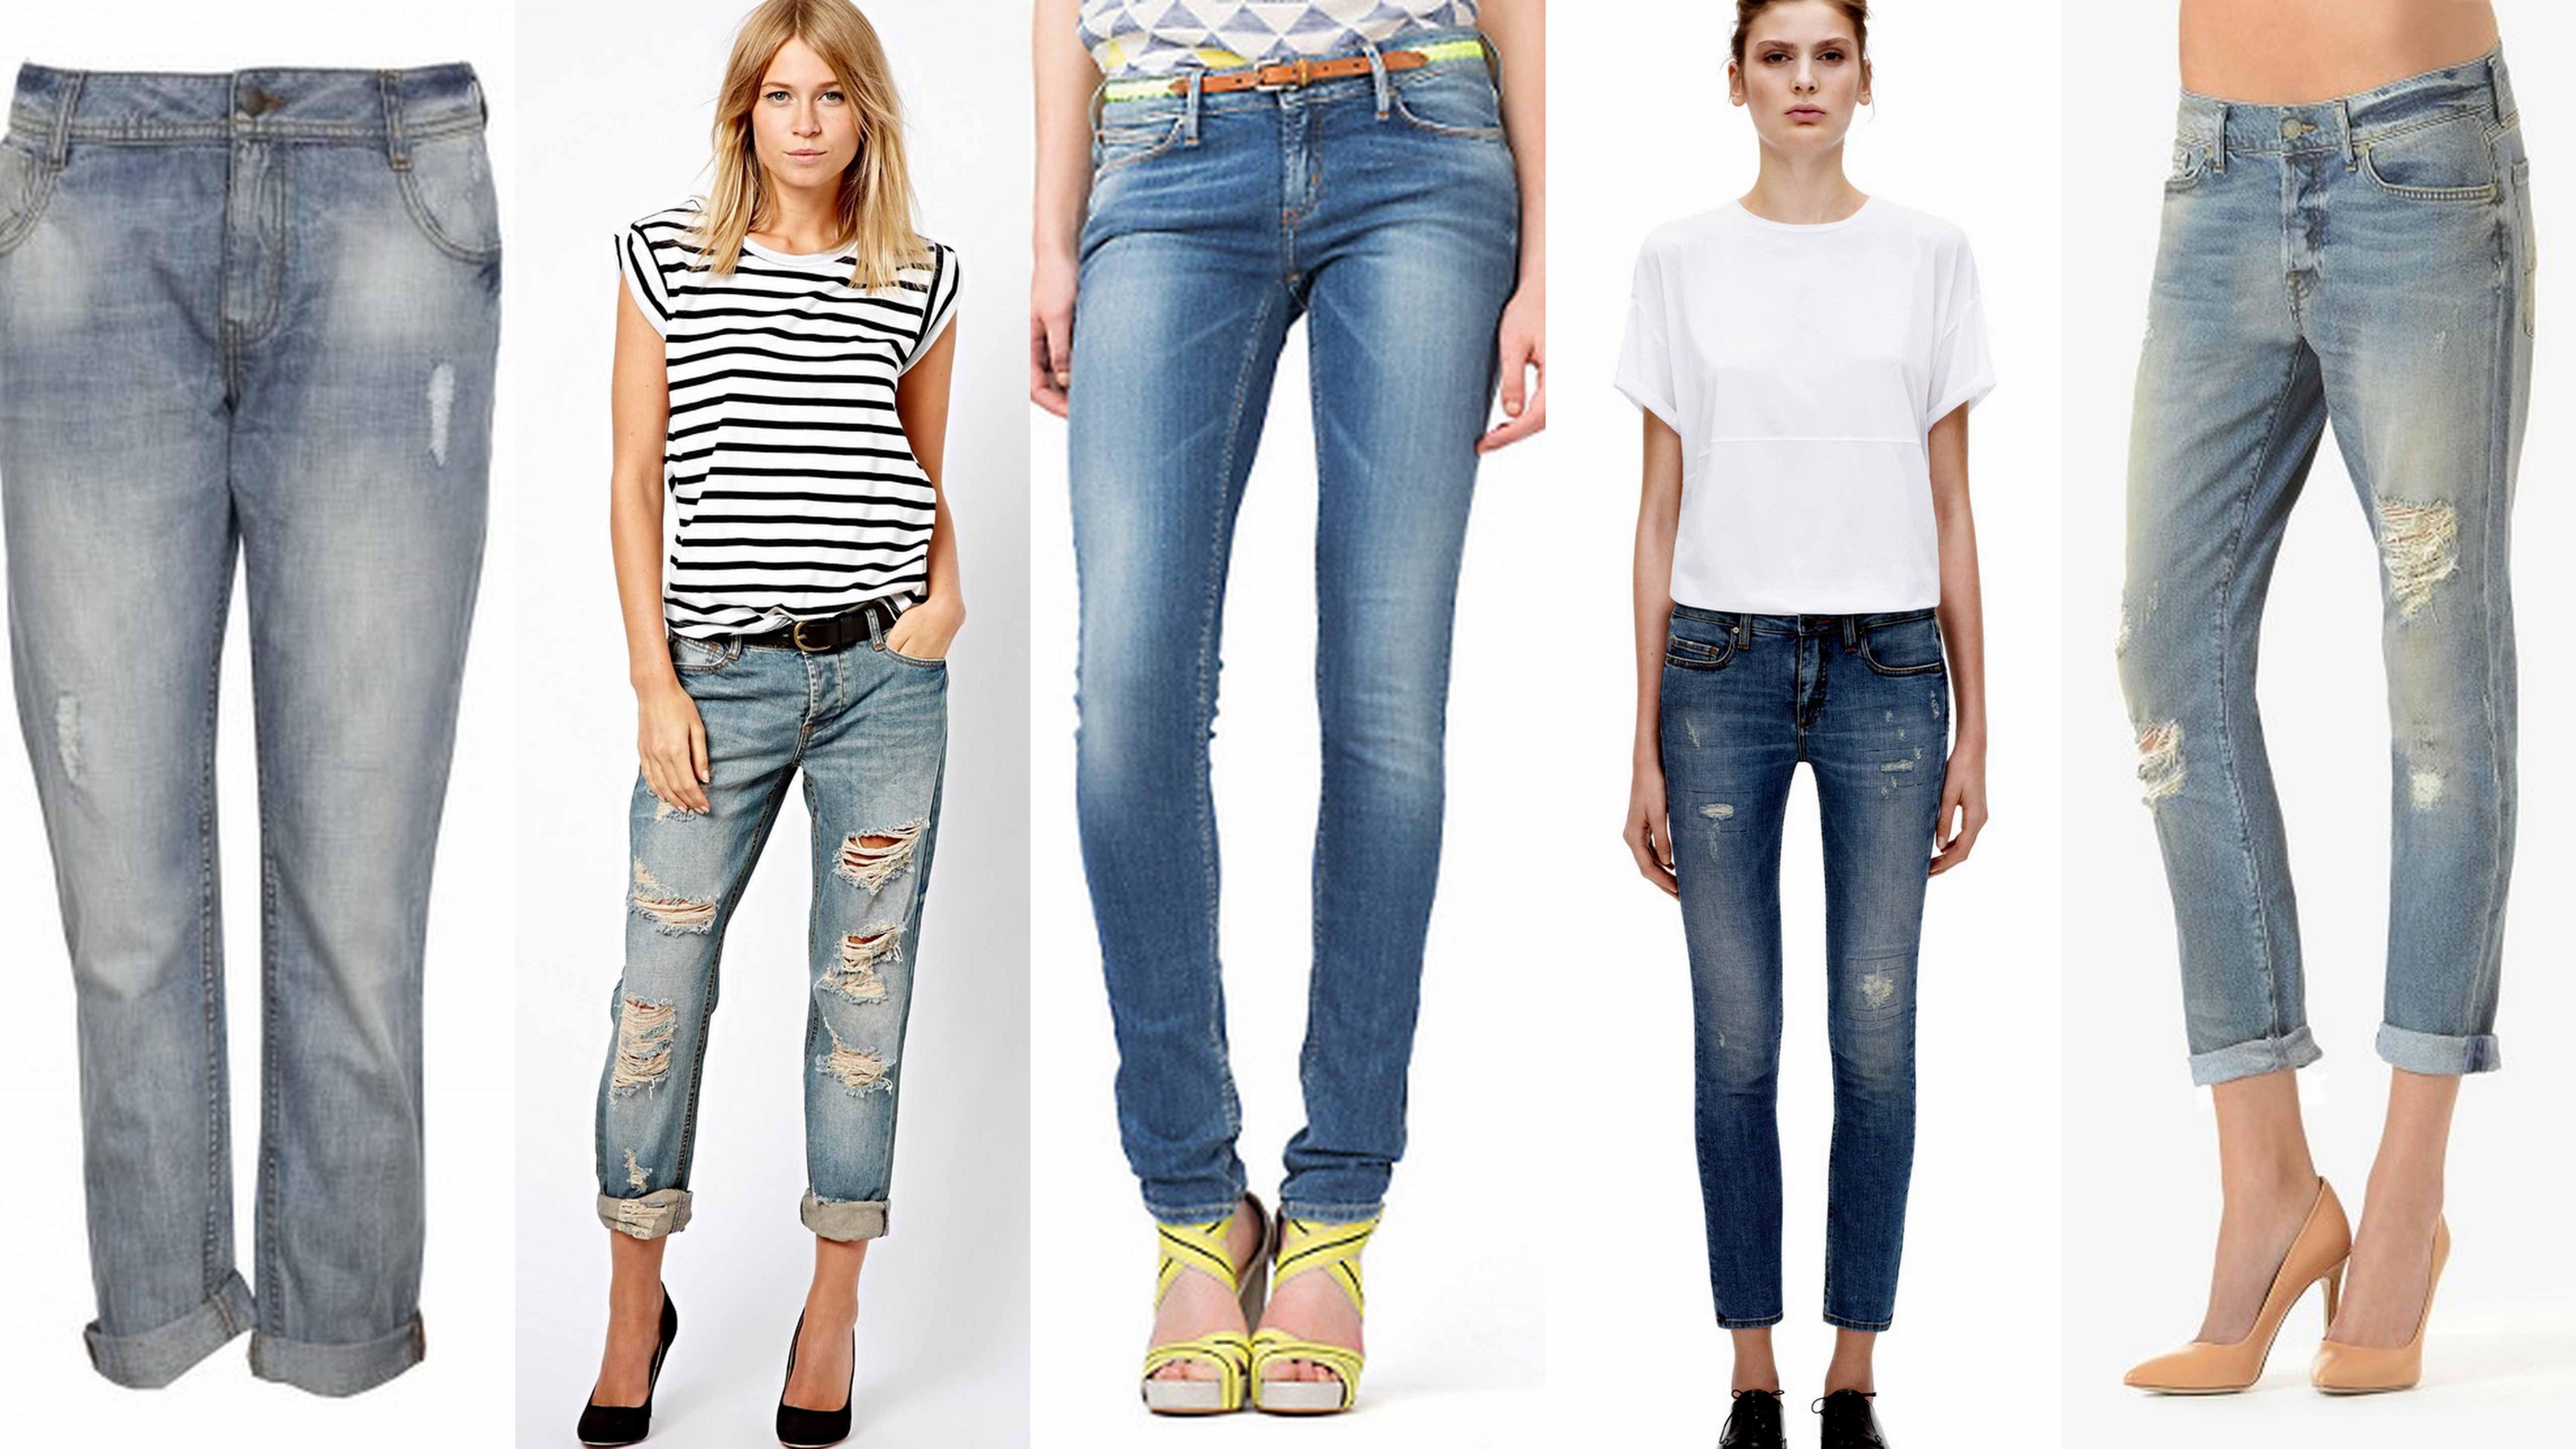 Mix and Match Style | Mix and Match Denim Jeans Fashion ...